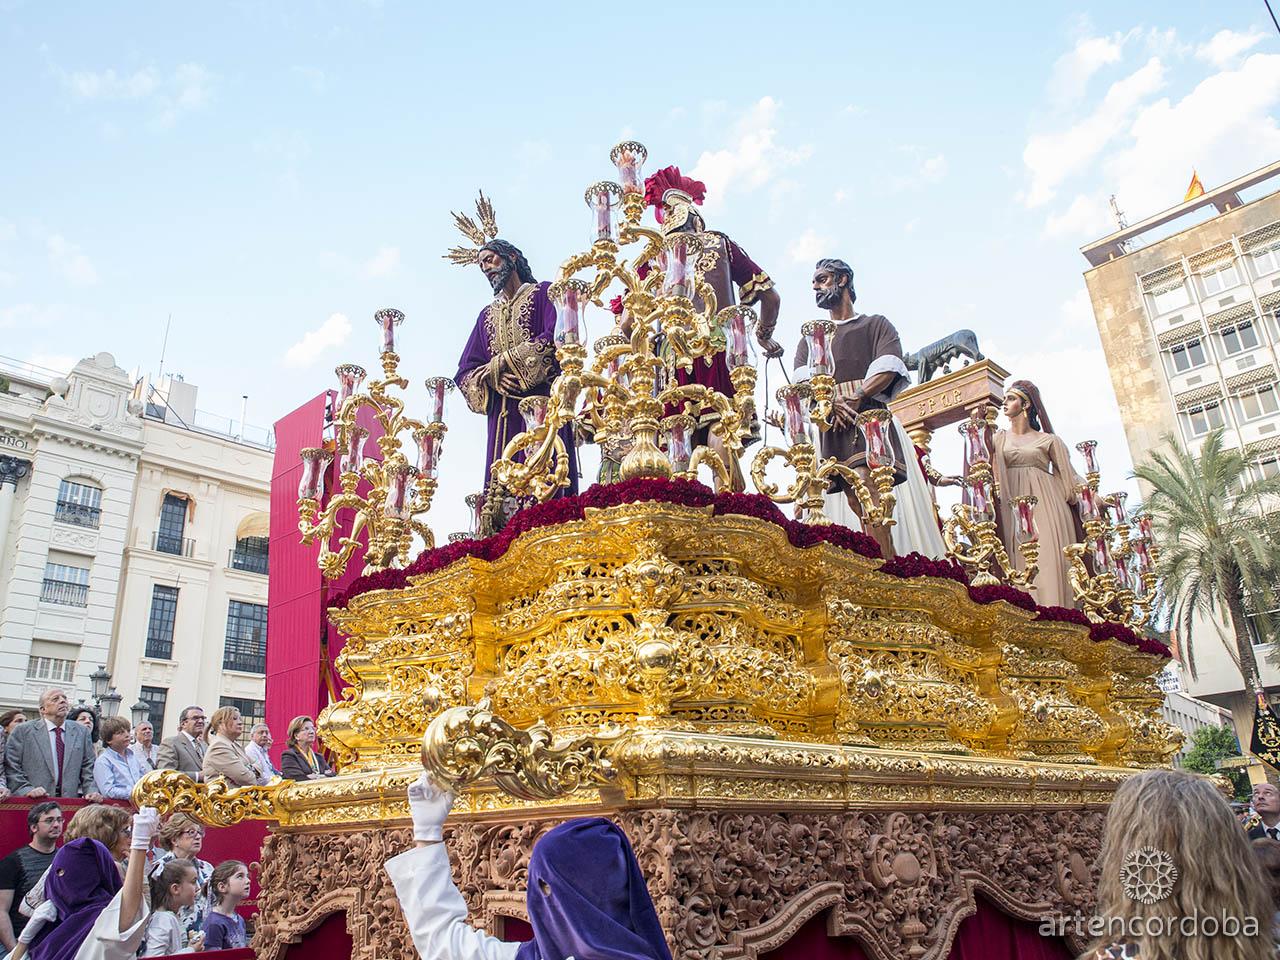 Señor de la Sangre - Hermandad de la Sangre (Císter) en Córdoba